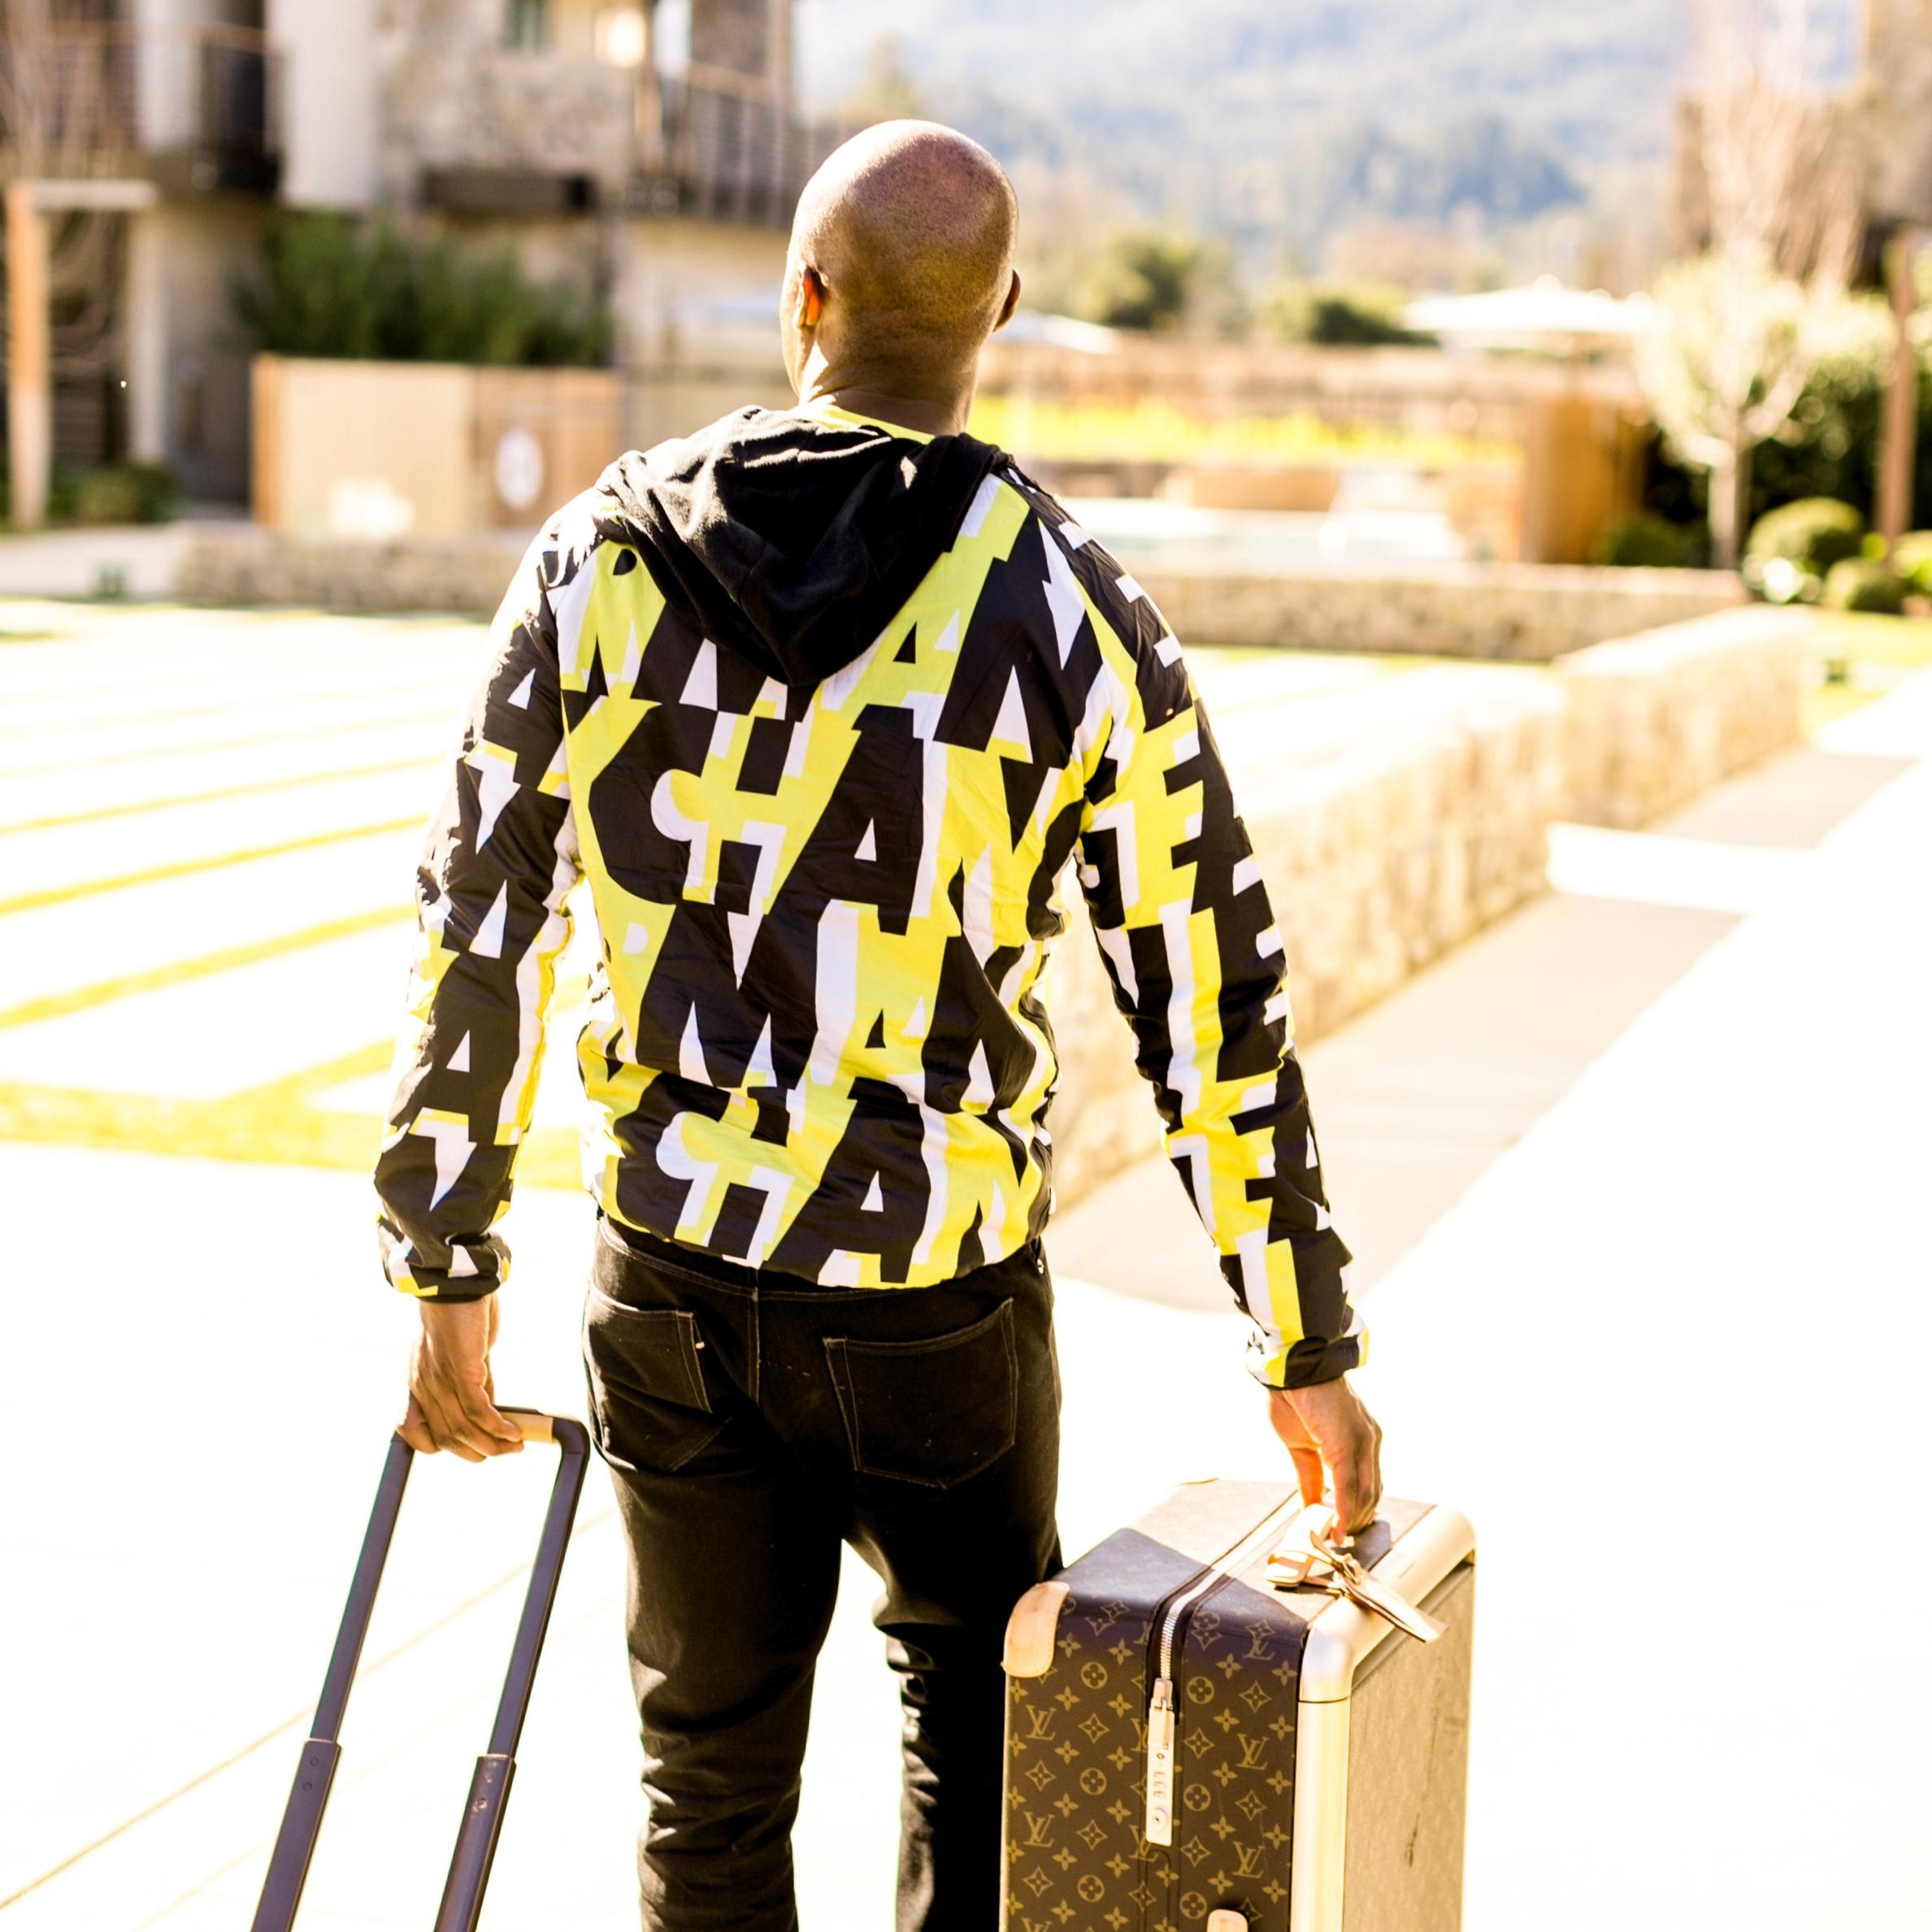 Luxury Travel  as;kd;laksd;lkas;dlkf  skfdl kasdlkf;asd  saldkj flasdlf k alsdk flkasd;lfk